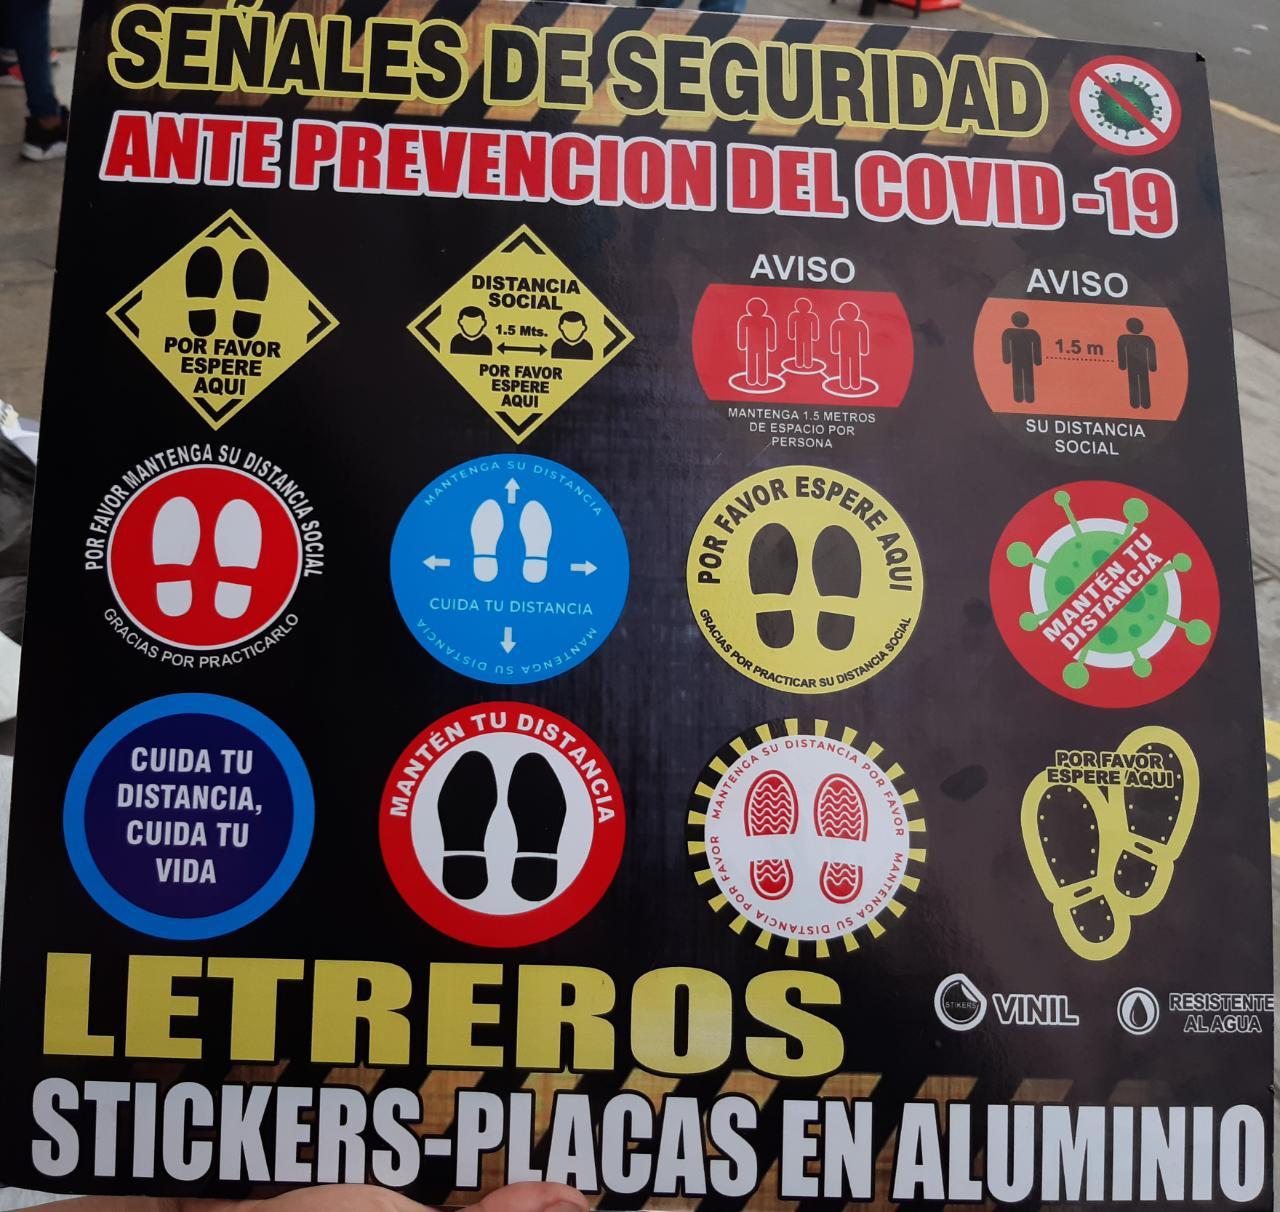 Señalización, Sticker en Vinil para Protocolo Inicio Actividades En Lima, Callao